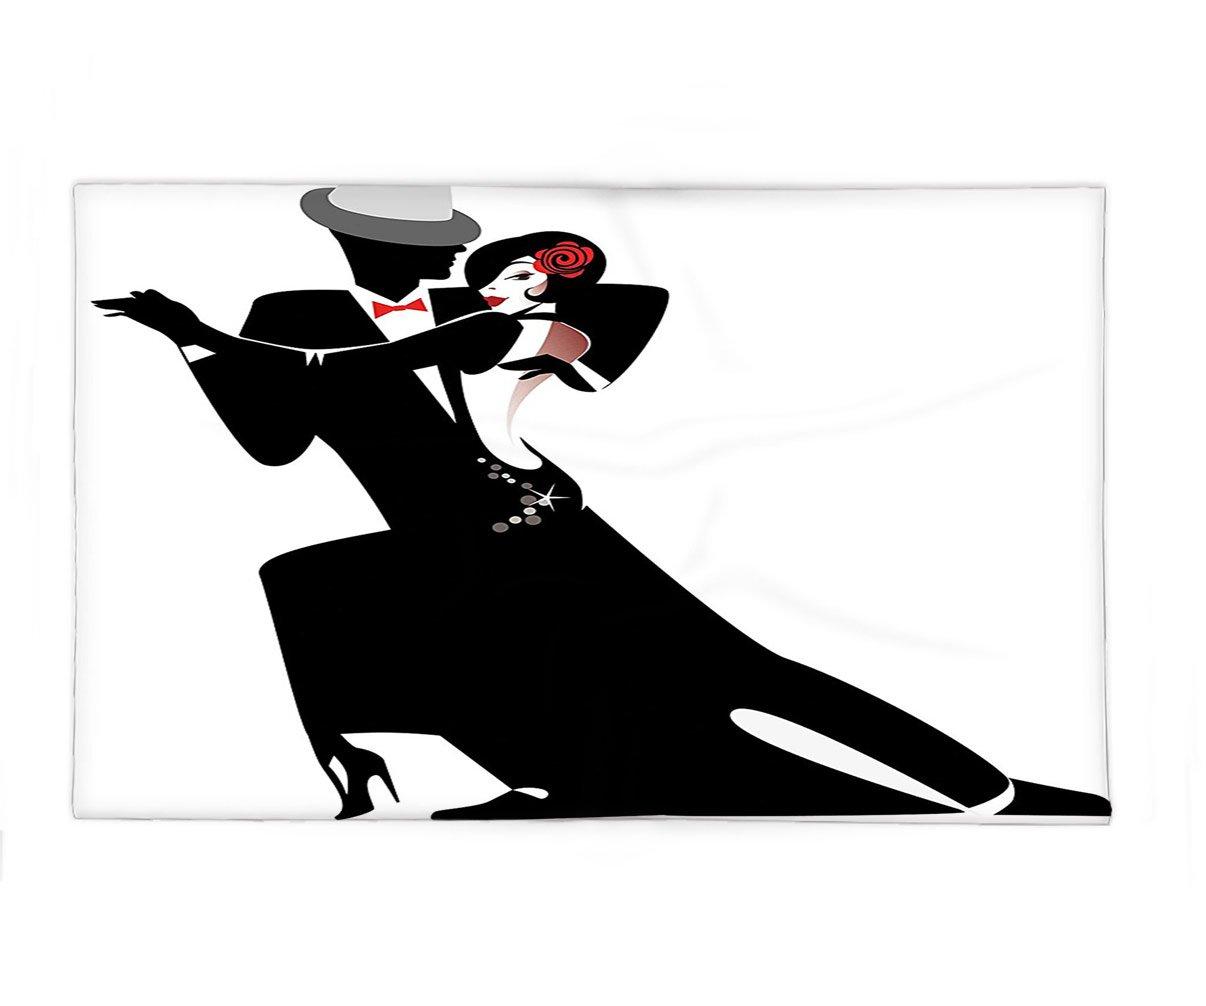 Interestlee Fleece Throw Blanket Girls Decor Man and Woman Partners Romantic Dance Tango Waltz Lovers in Rhythmic Music Art Print Black White